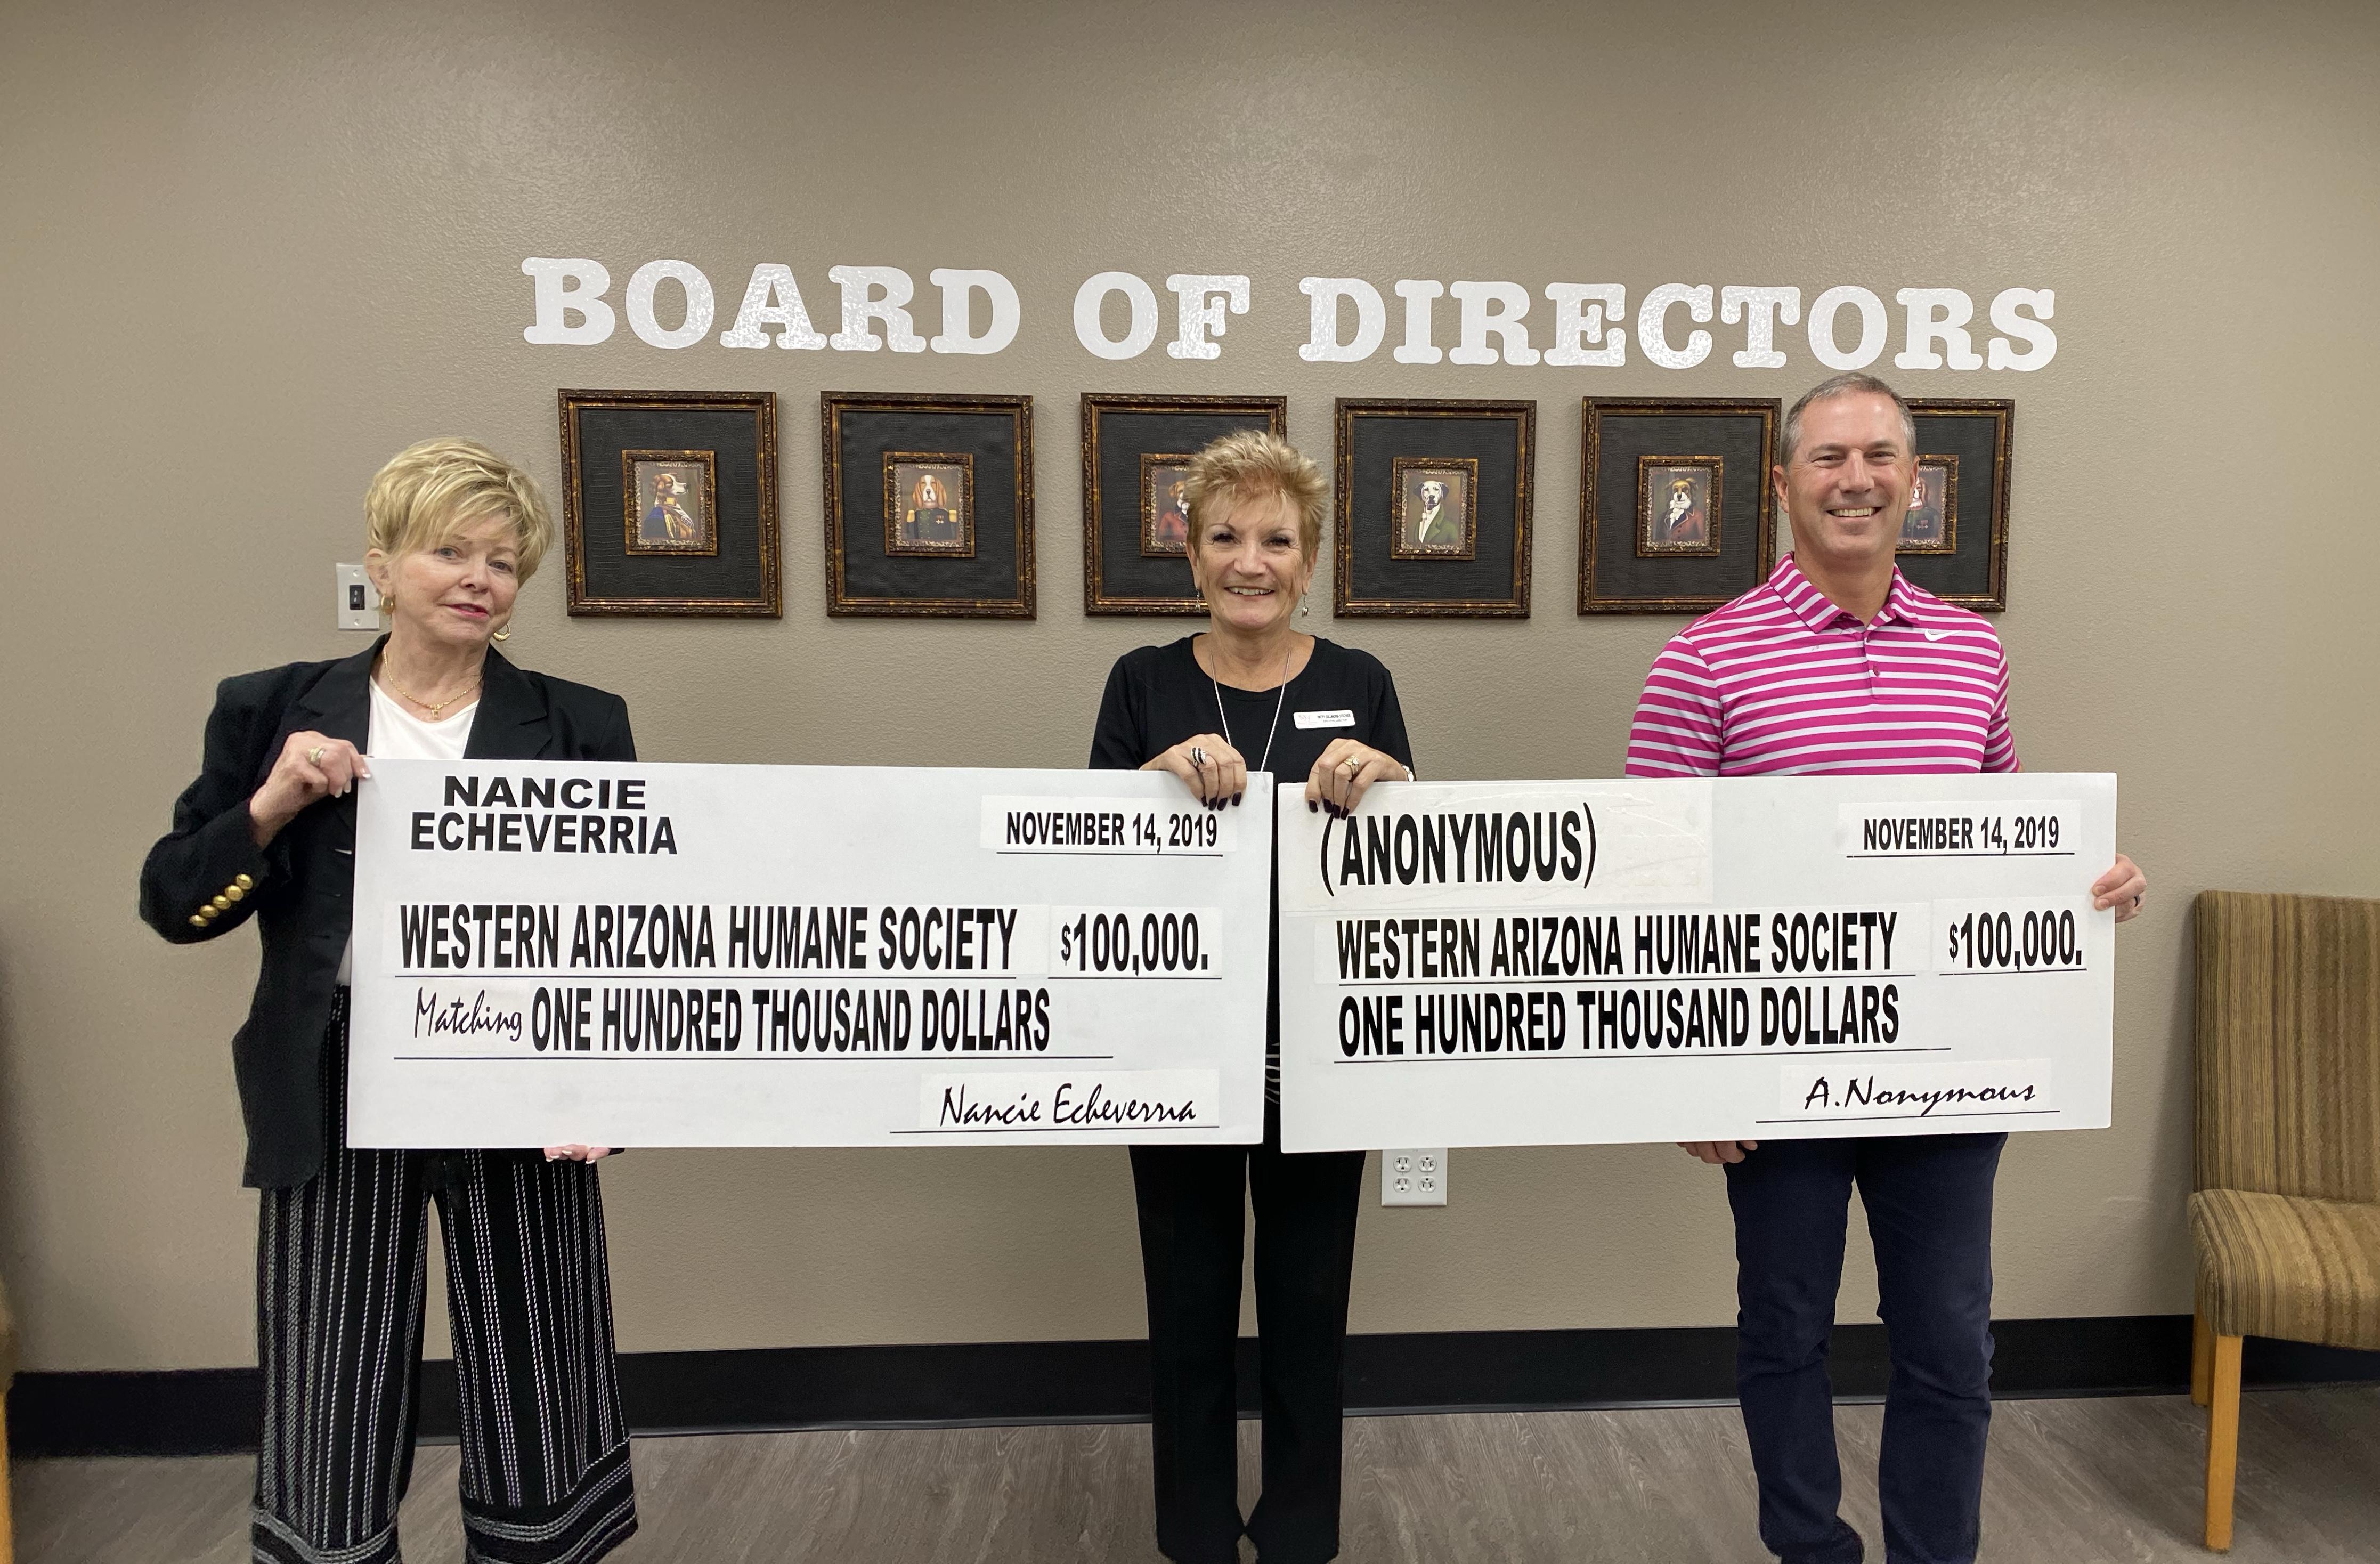 Western Arizona Humane Society Gifted With Generous Donation